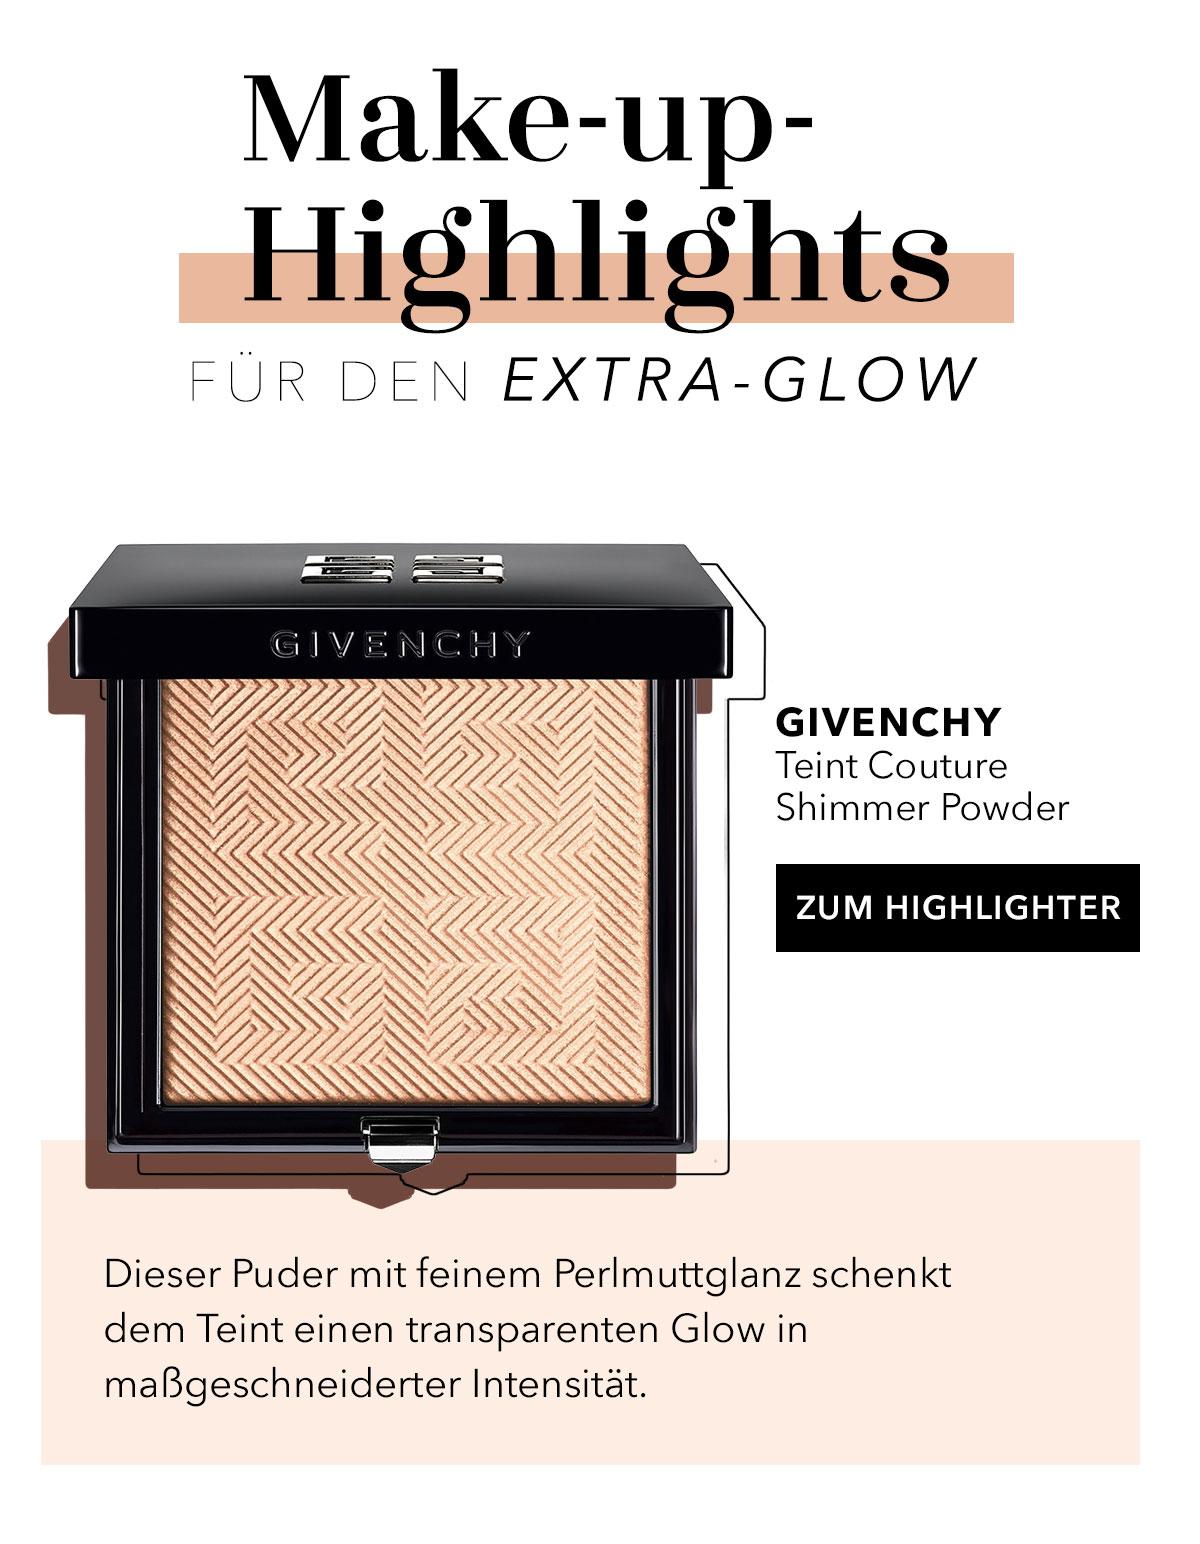 Givenchy Highlighter